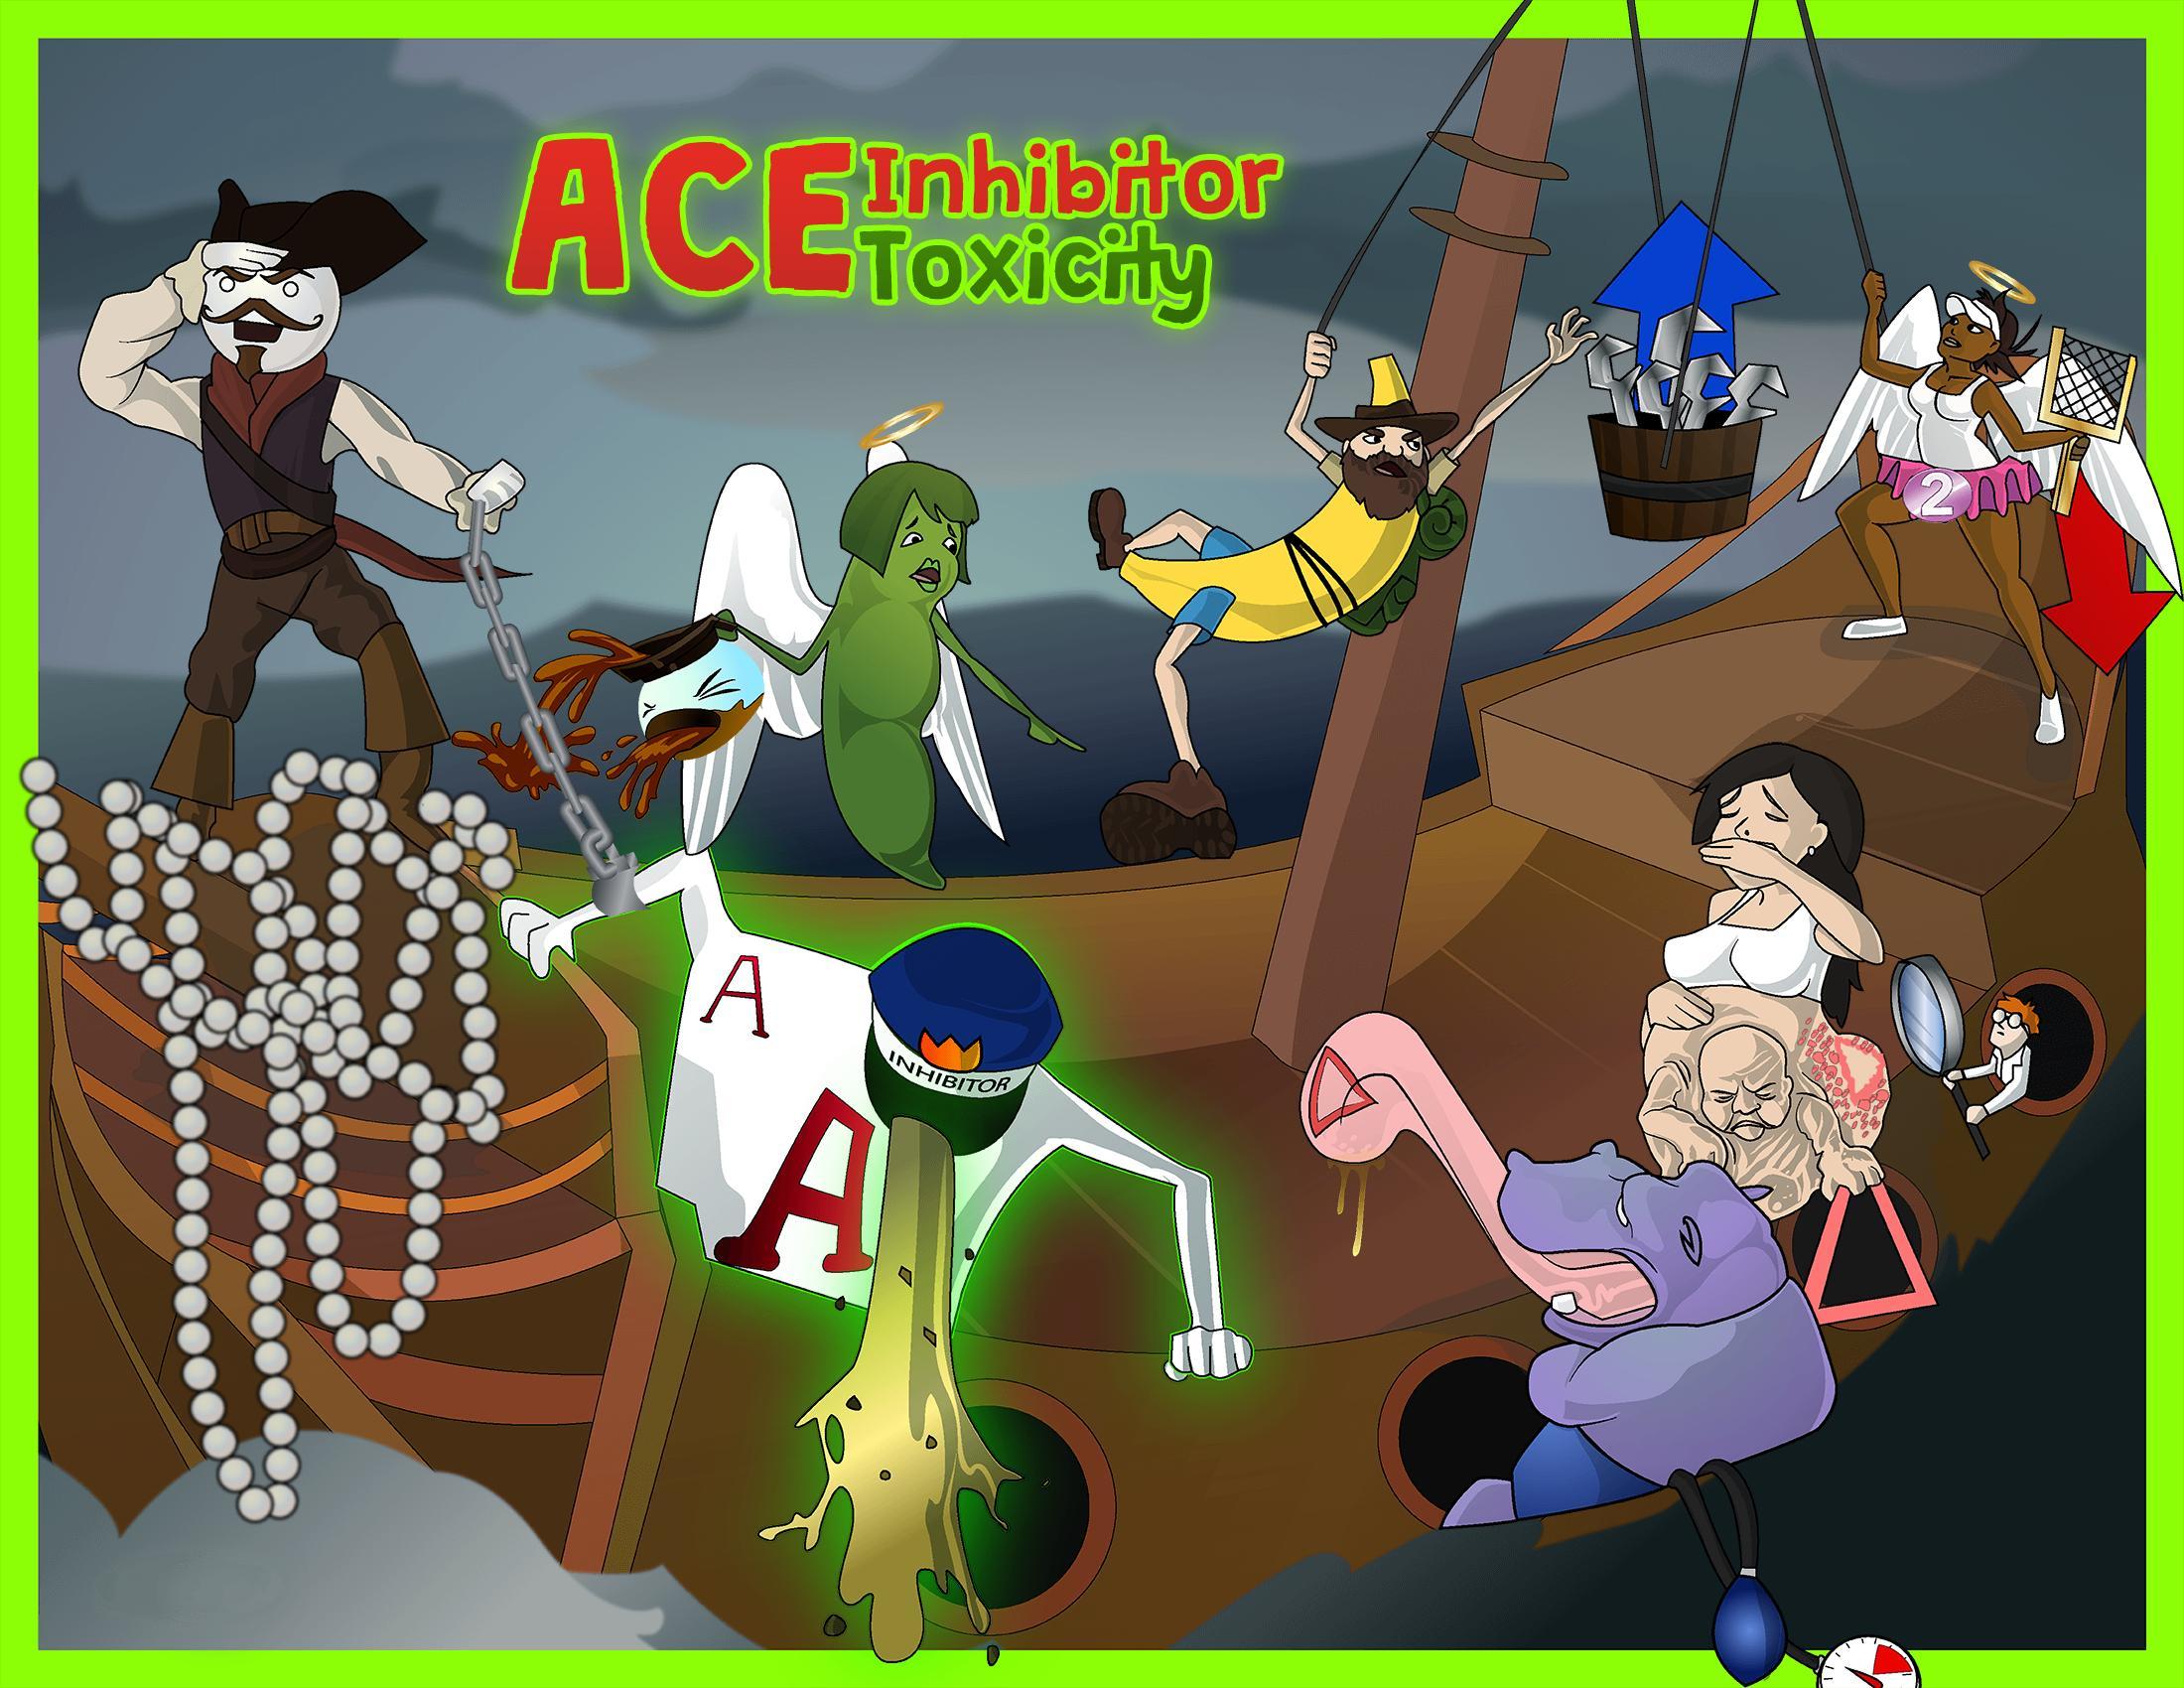 ACE Inhibitor Toxicity